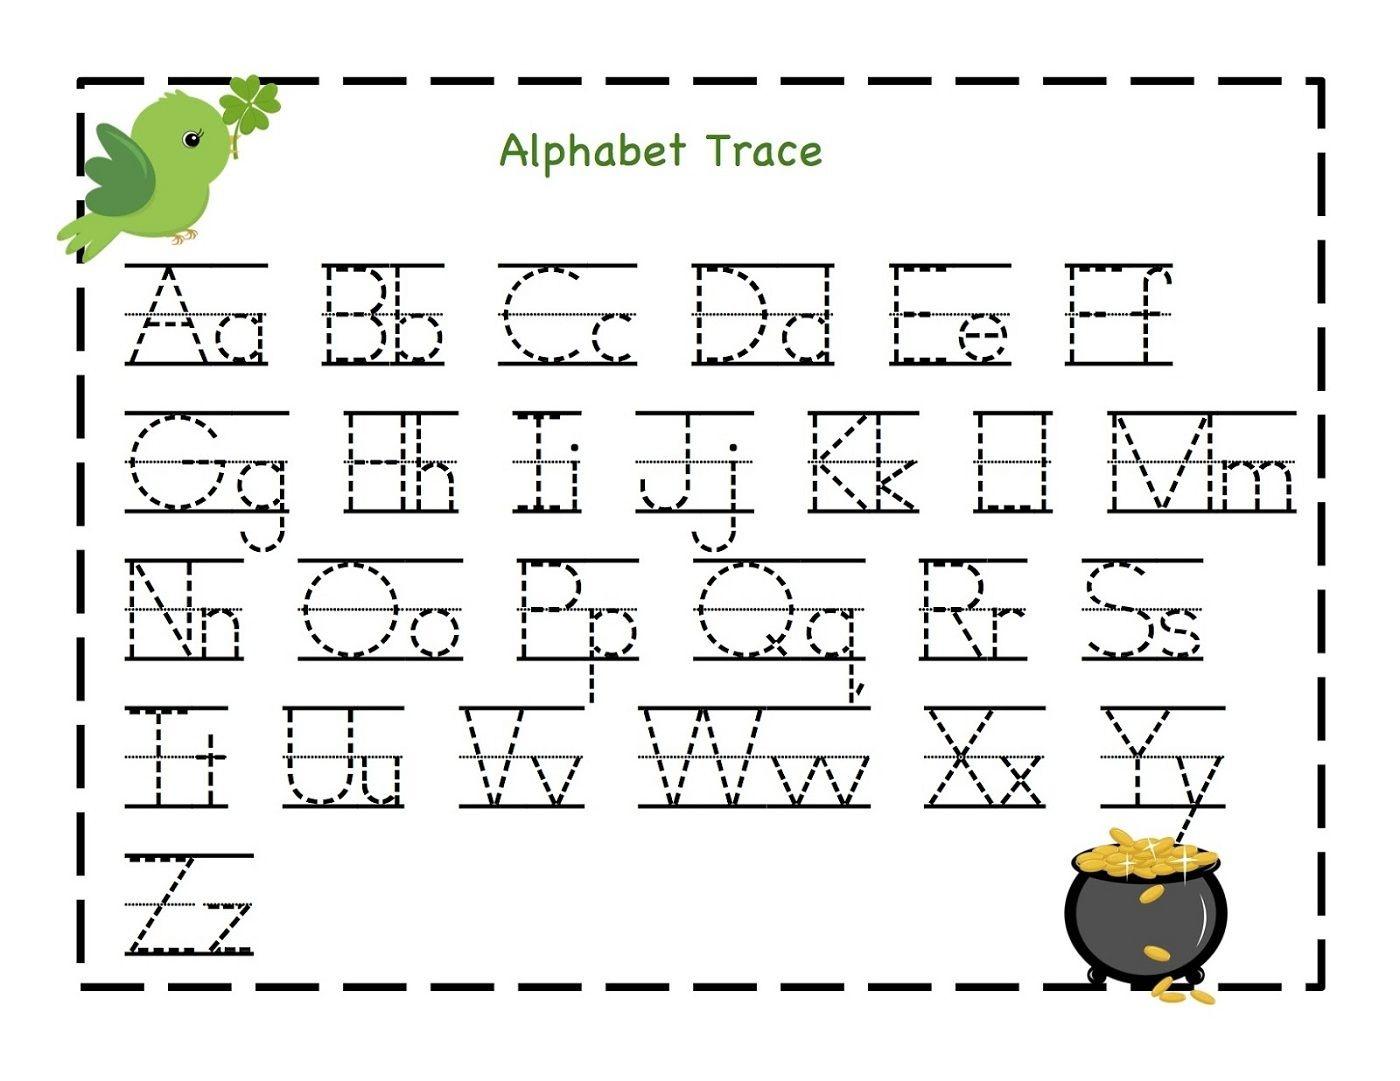 Traceable Letter Worksheets To Print | Schoolwork For Taj And Bre - Free Printable Alphabet Worksheets For Kindergarten